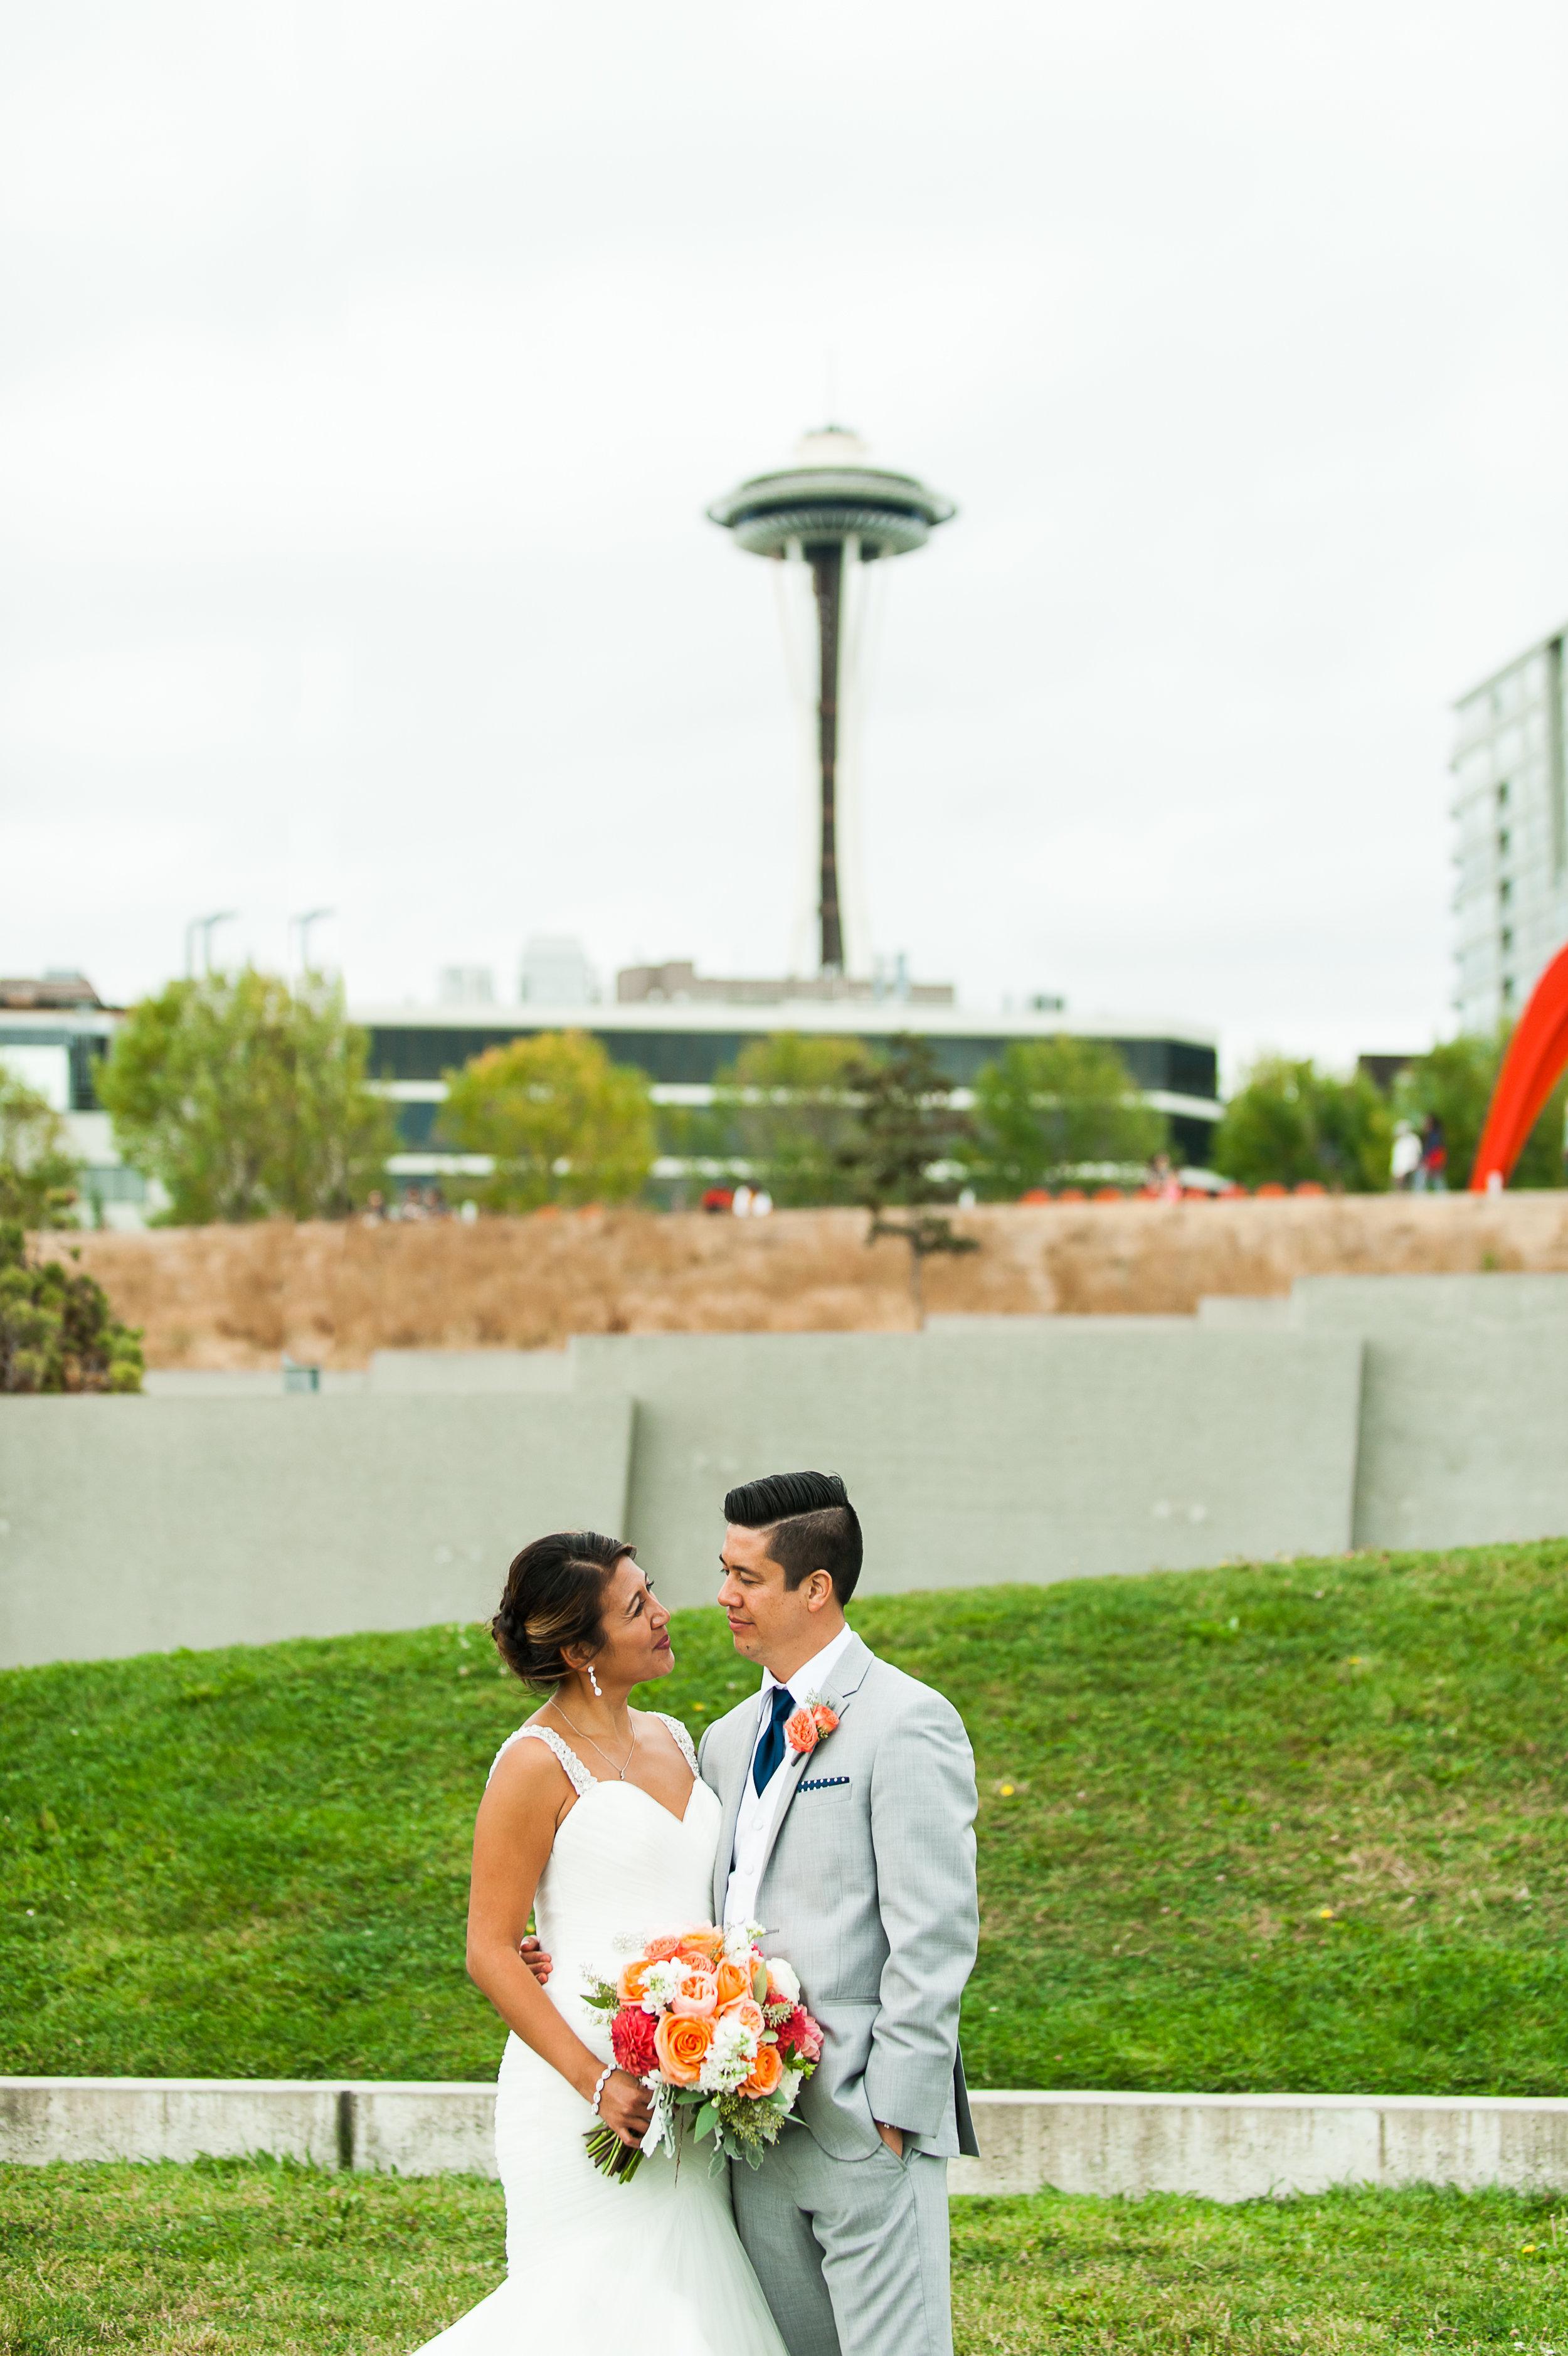 DJ-wedding-Van-Wyhe-Photography-232.jpg